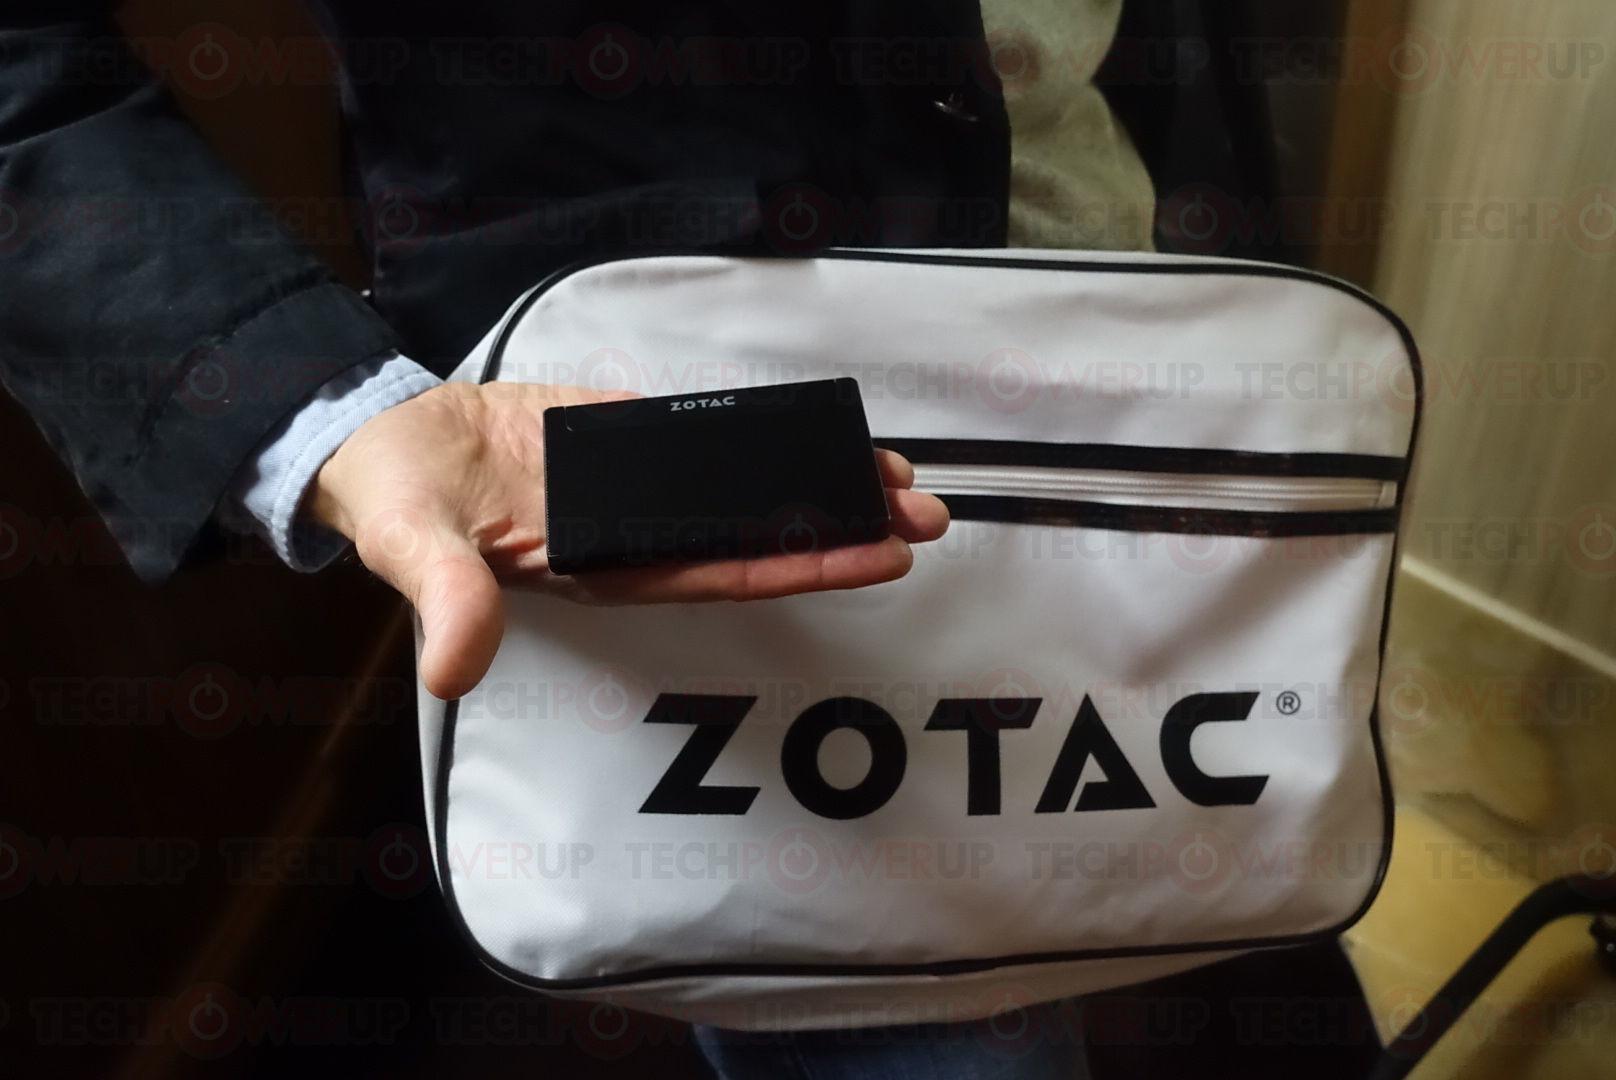 Zotac Pico PI226 quiere ser el mejor mini PC del mercado